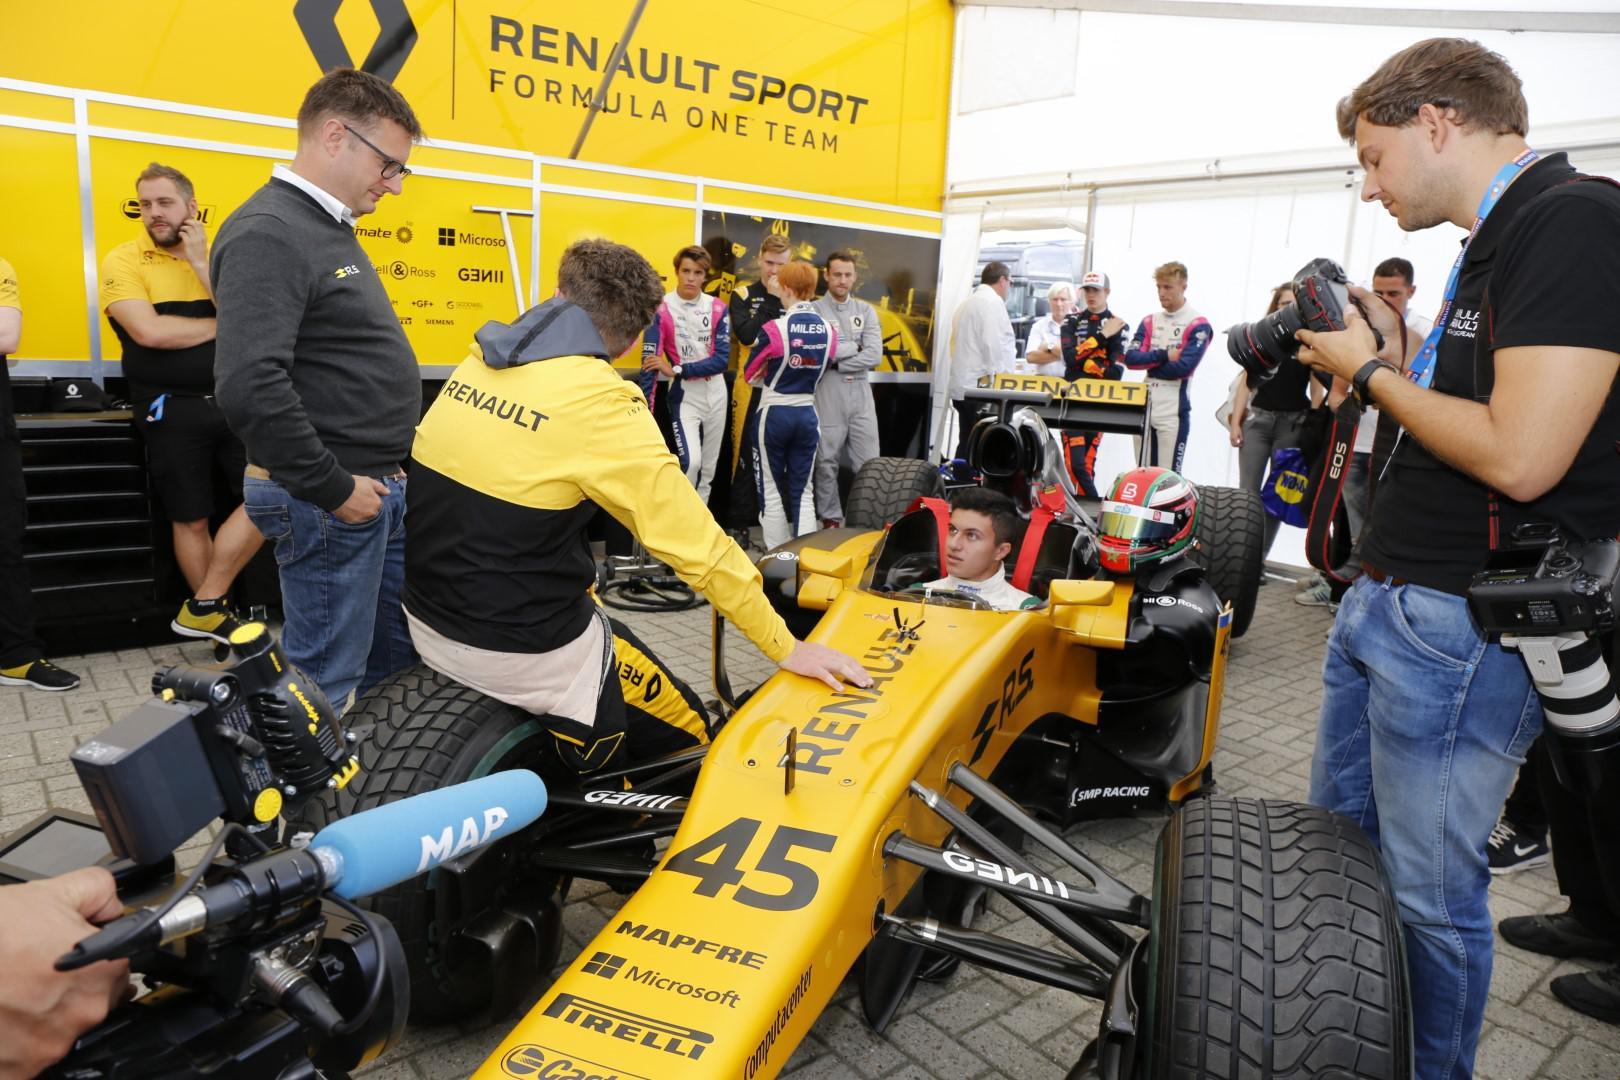 michael-benyahia-integre-le-top-3-du-championnat-nec-formule-renault-2-0-398-4.jpg